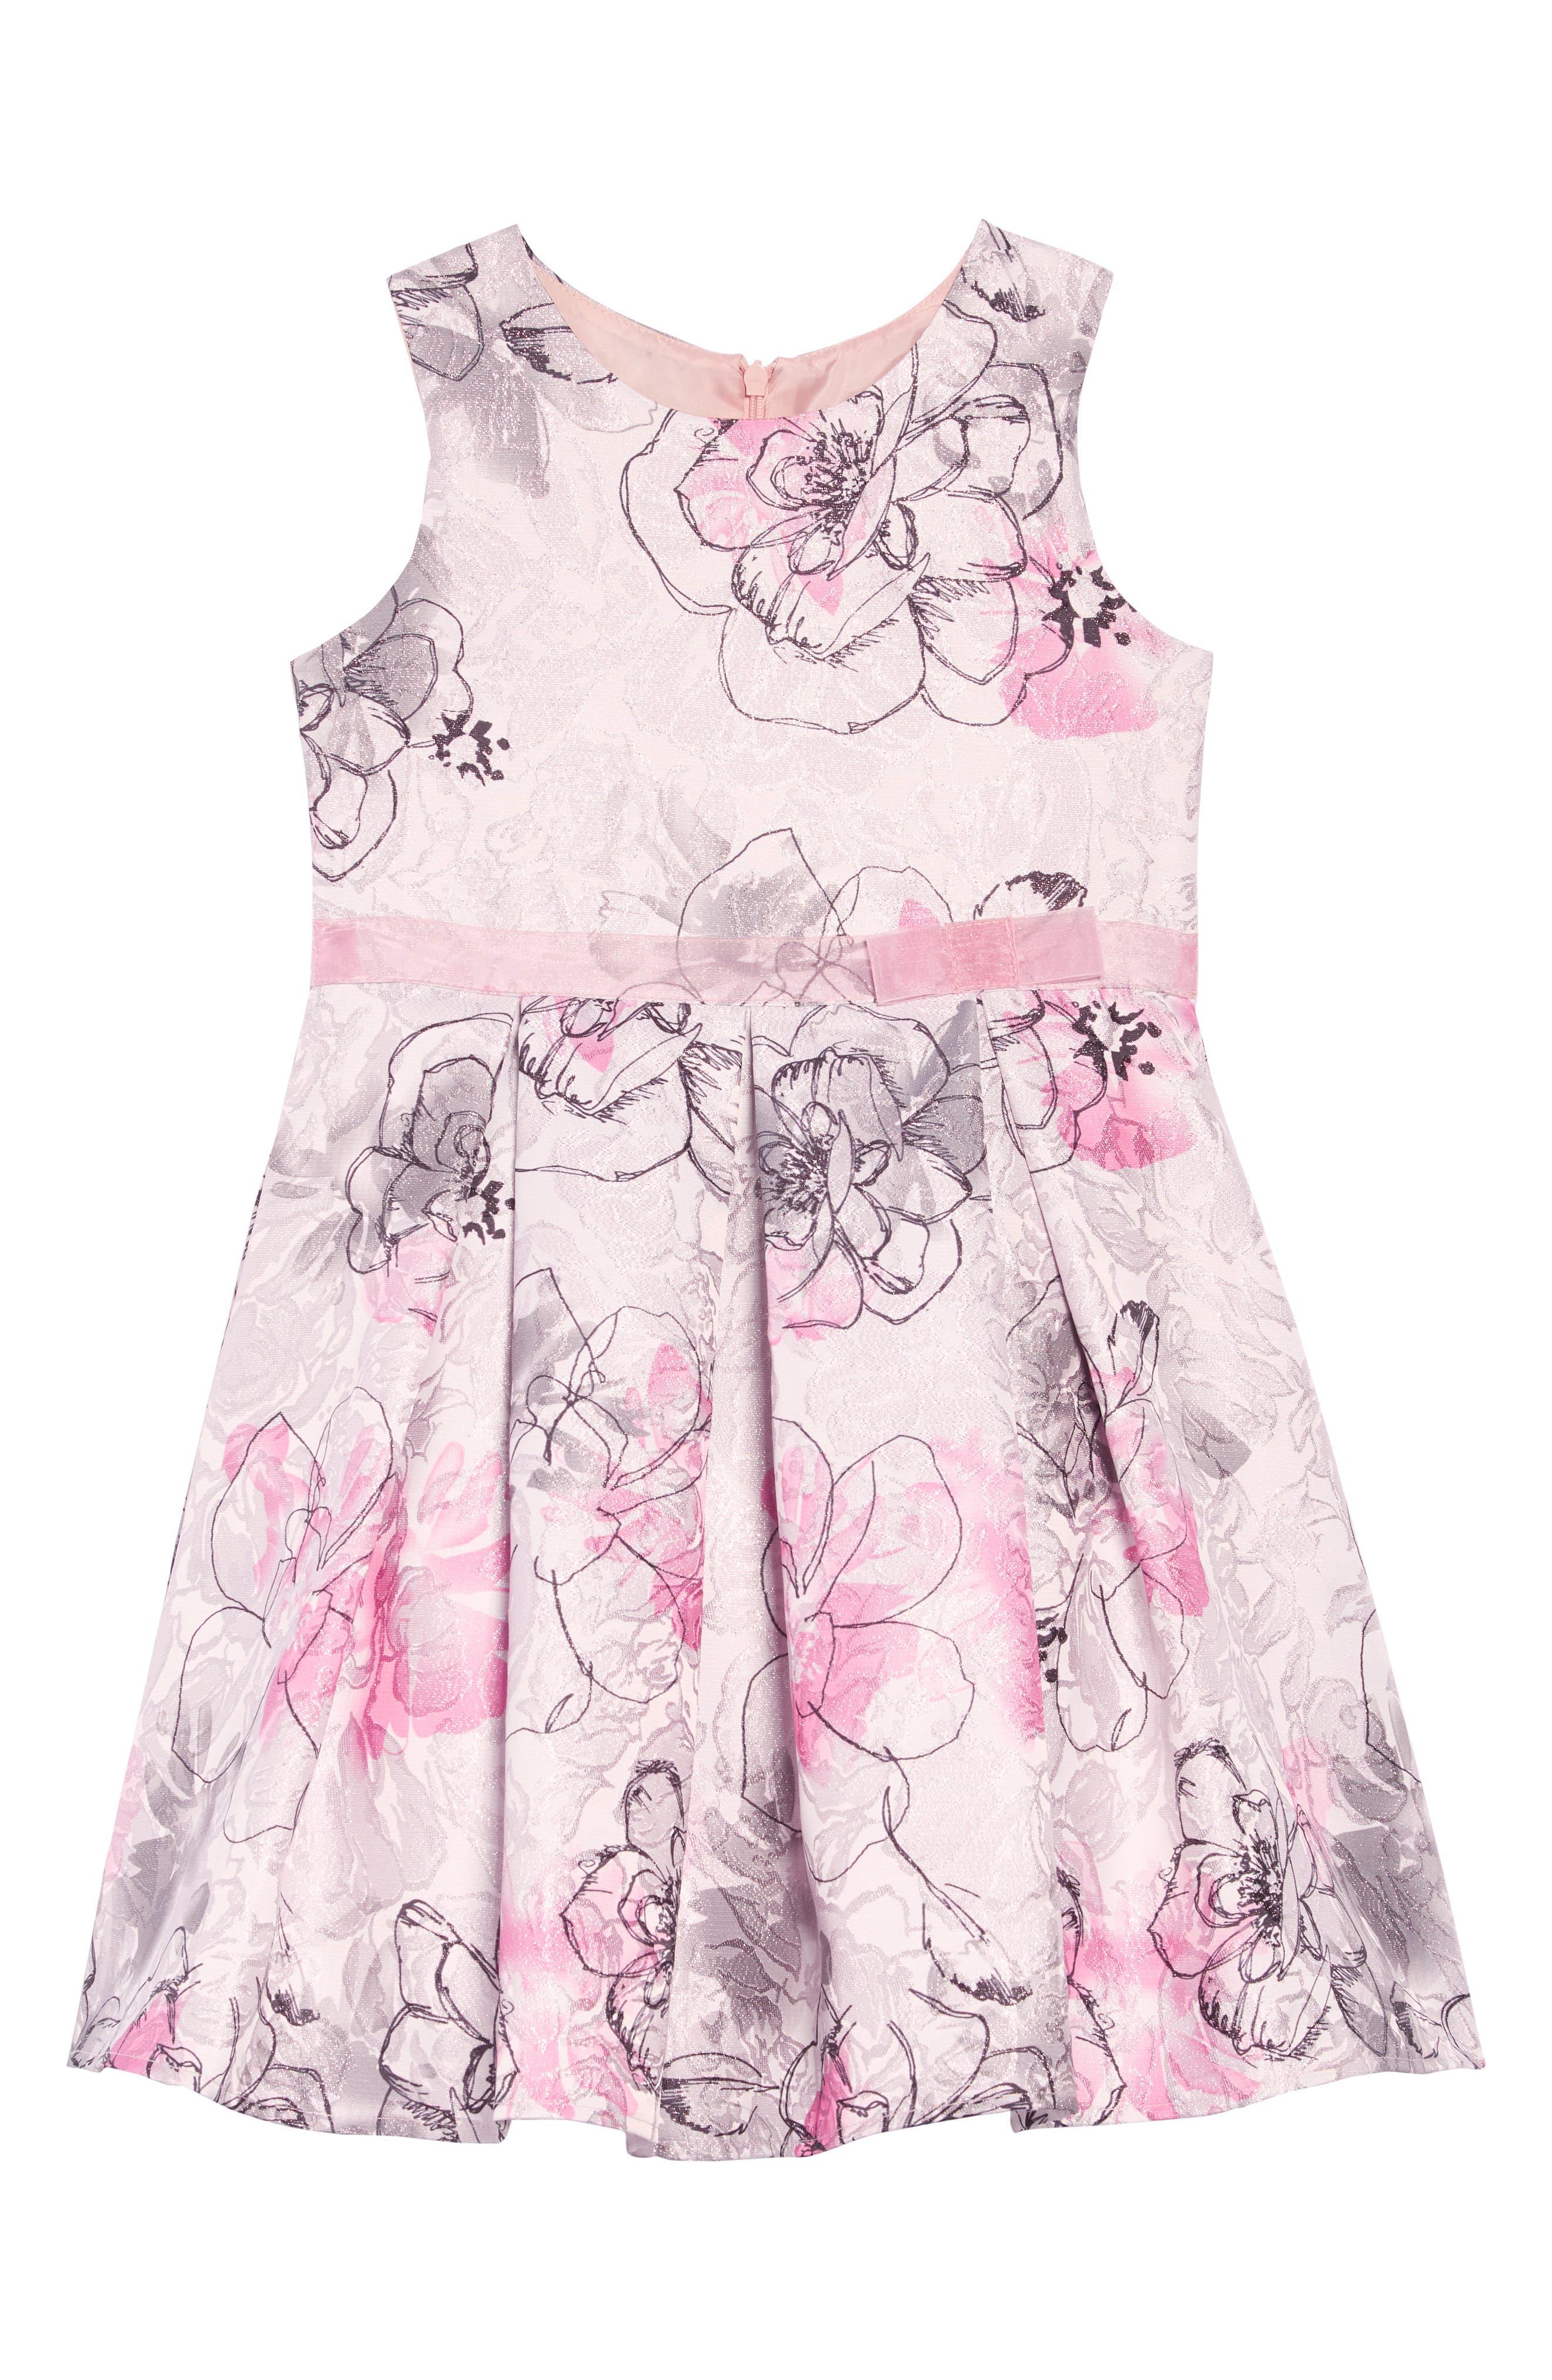 Jacquard Floral Dress,                         Main,                         color, MULTI PRINT